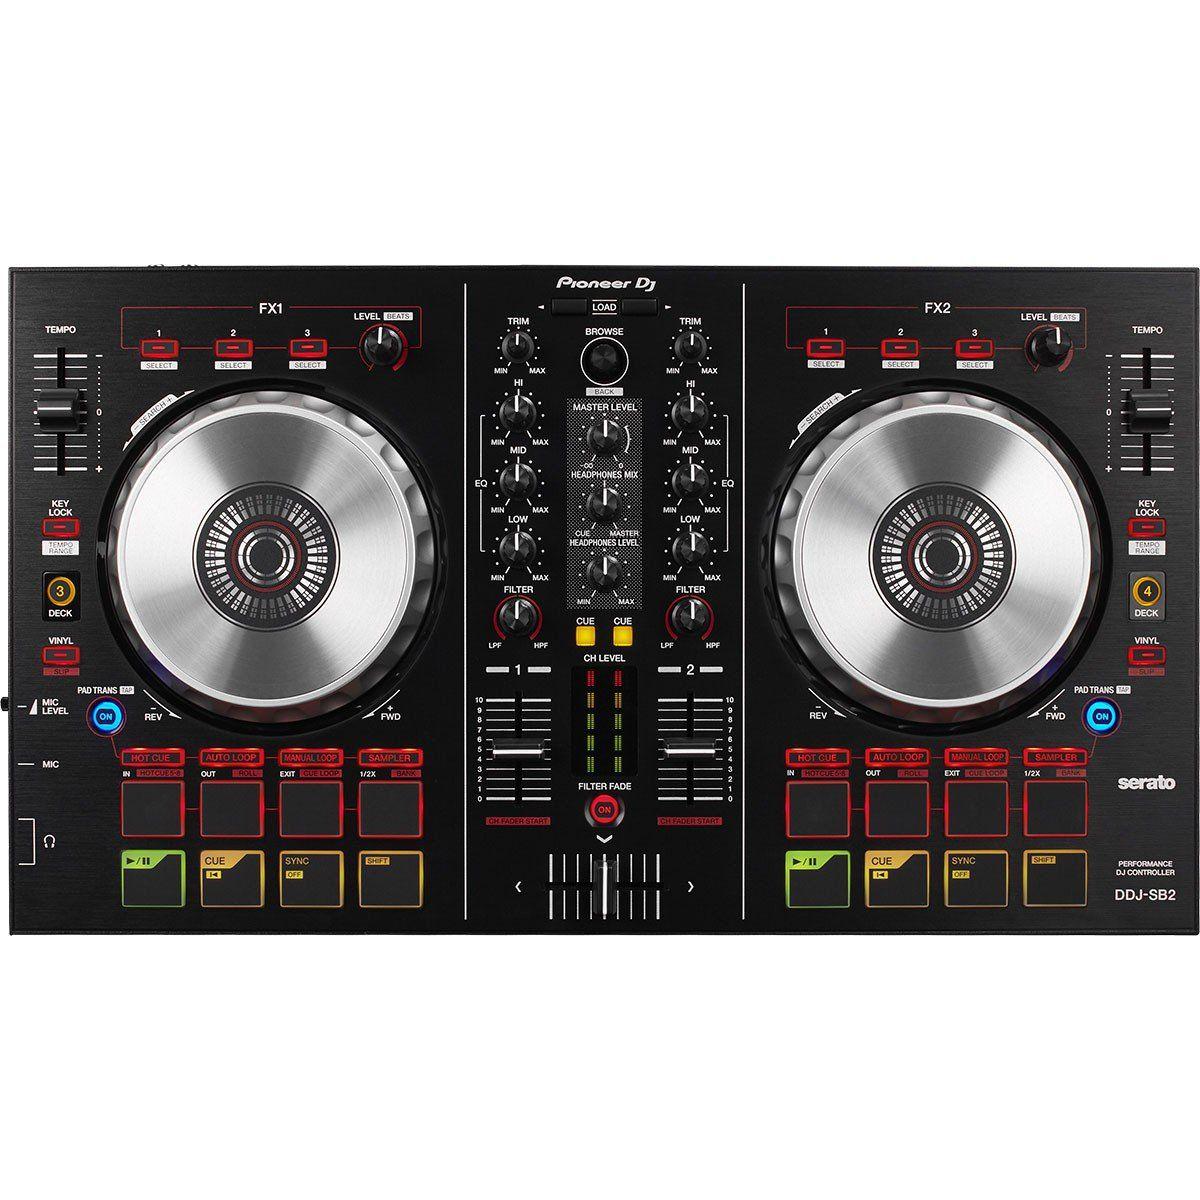 Pioneer DDJ-SB2 Controladora DJ DDJ SB2 Serato DJ Lite 2-Canais 4-Decks